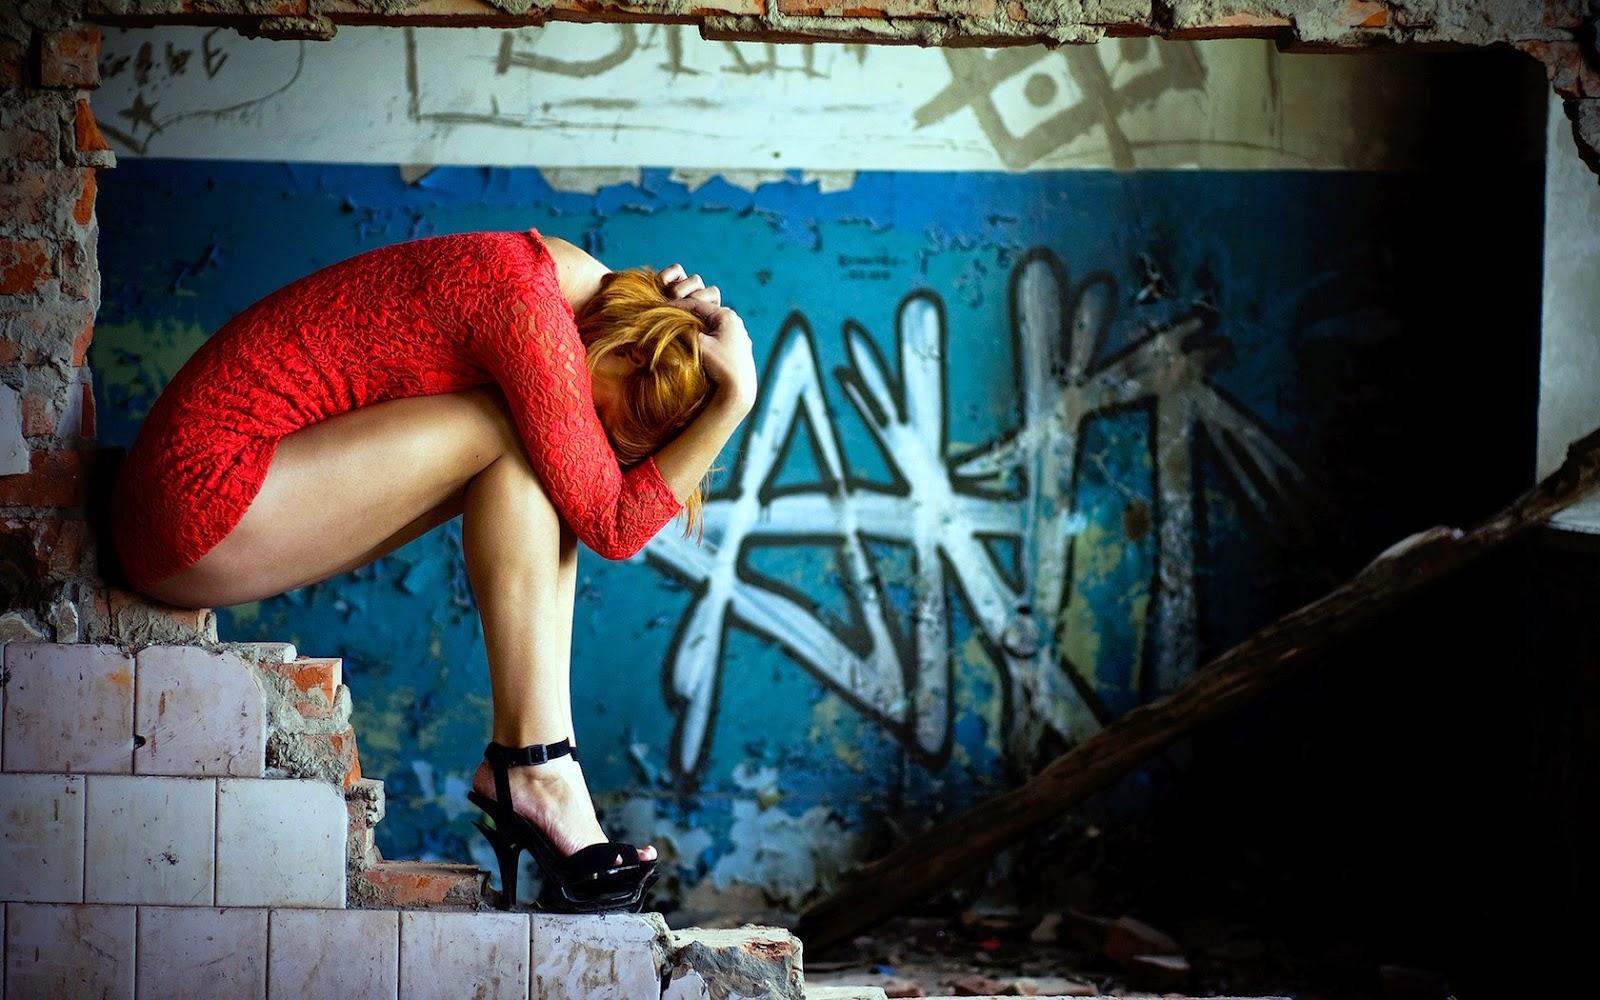 directorio prostituta callejera paseo